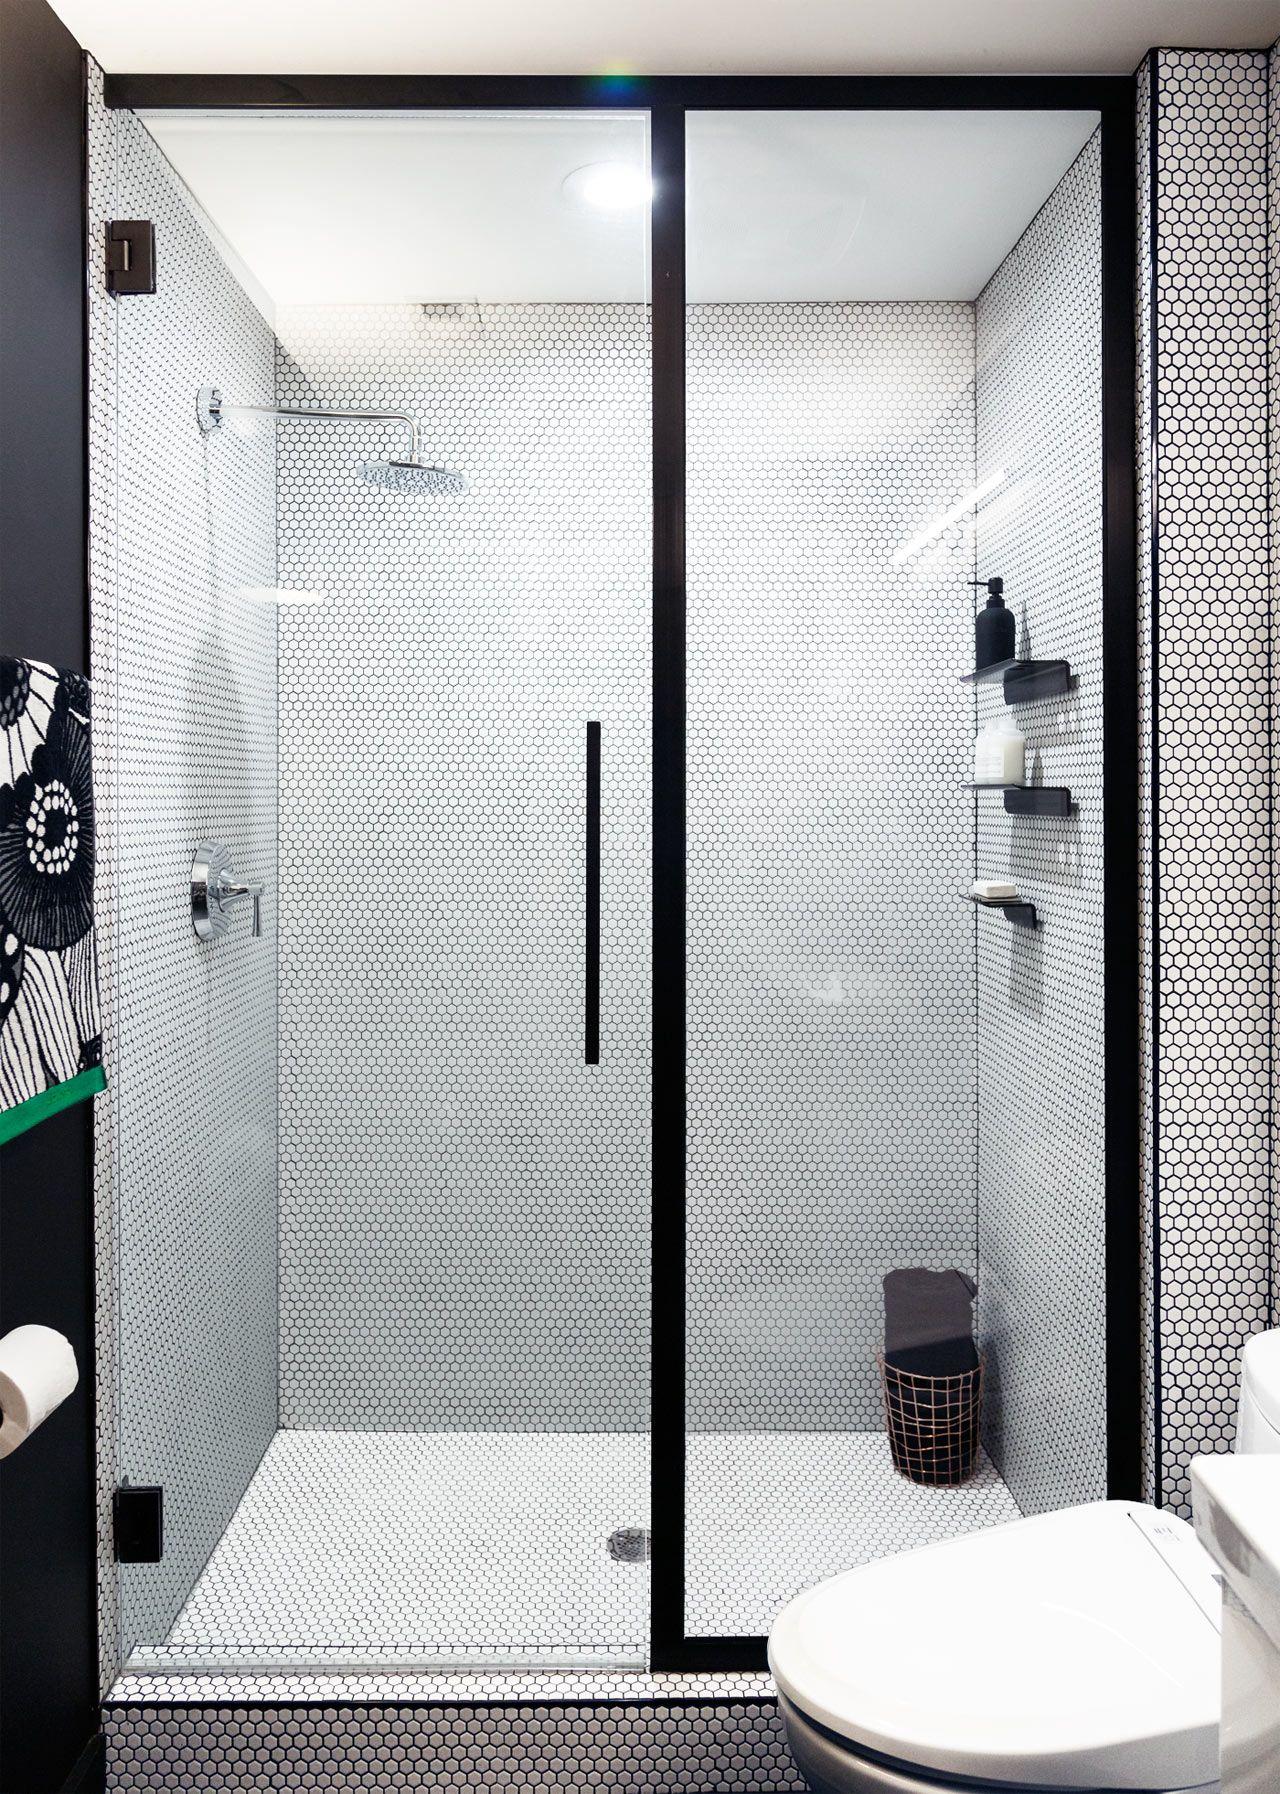 Basic Bathroom Gets a Graphic, Modern Renovation | Modern, Interiors ...